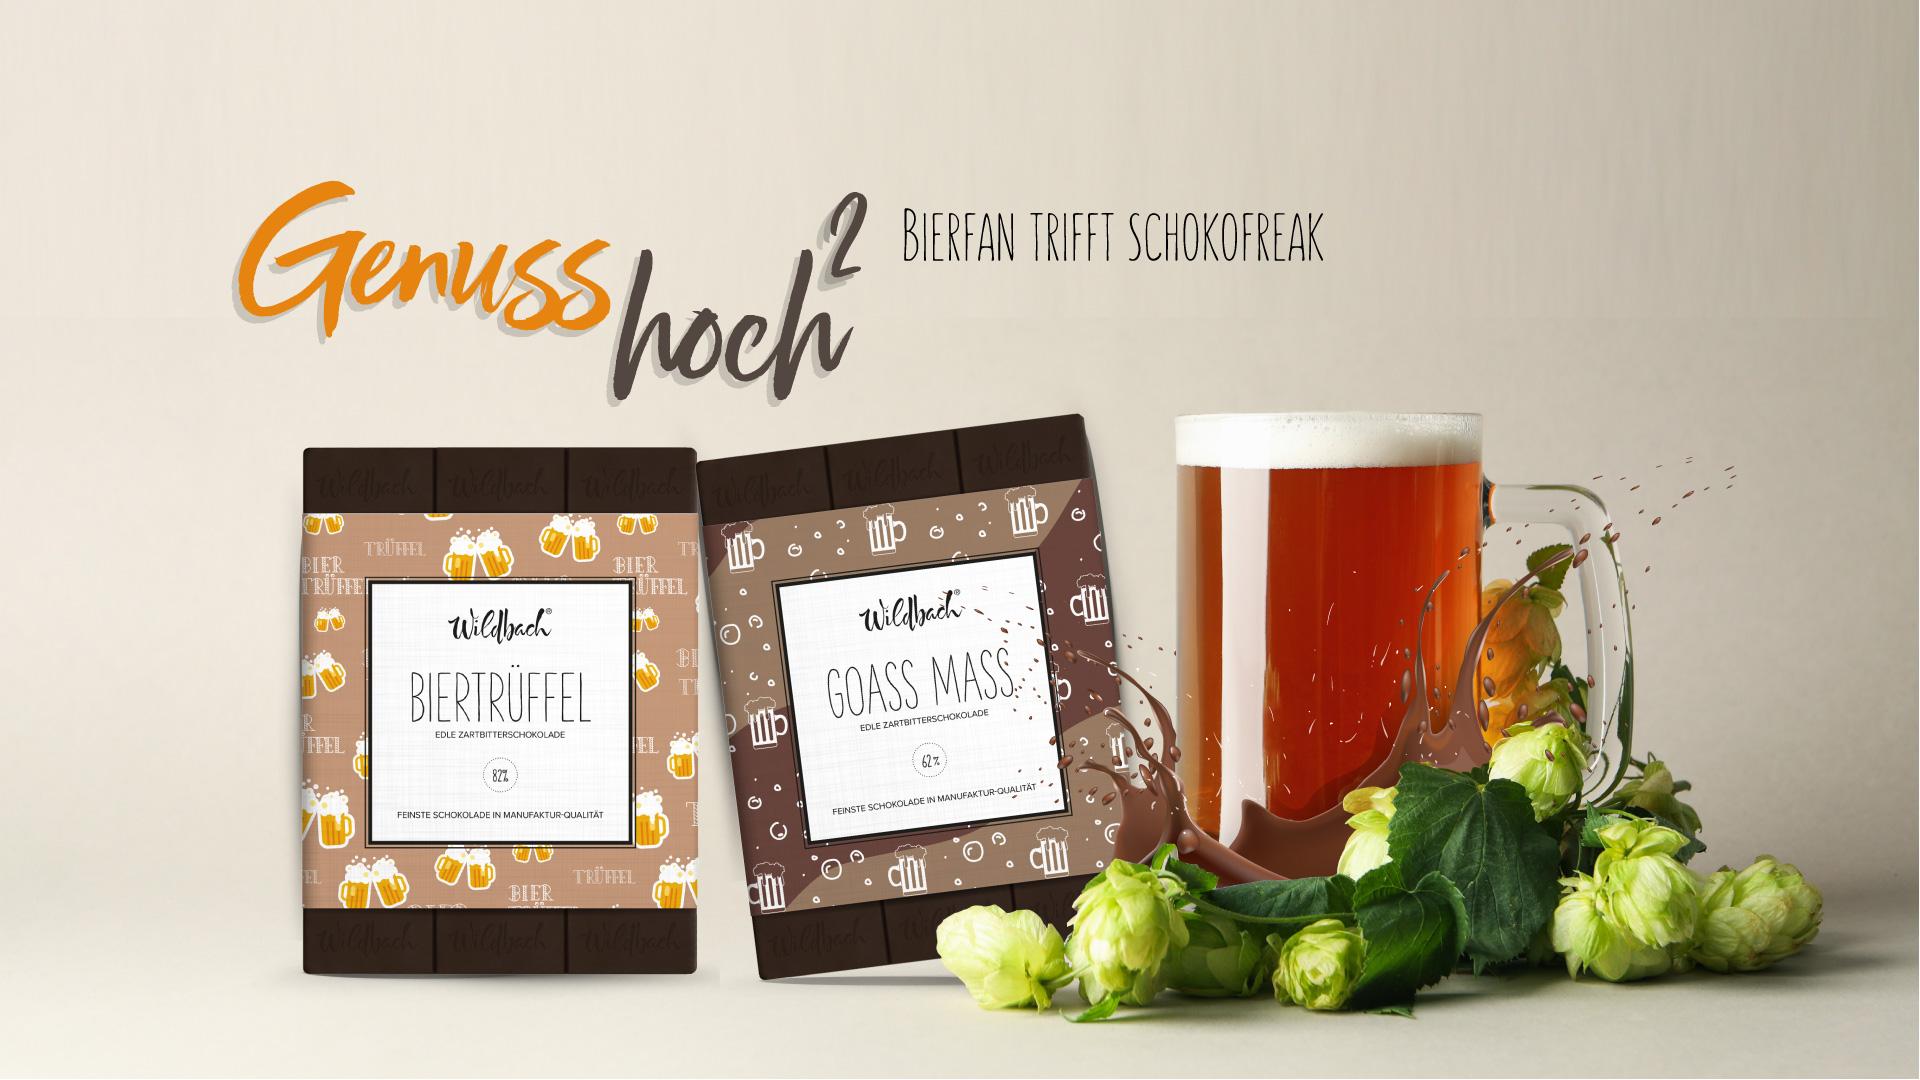 Wildbach-Schokolade-Bier-trifft-Schokolade